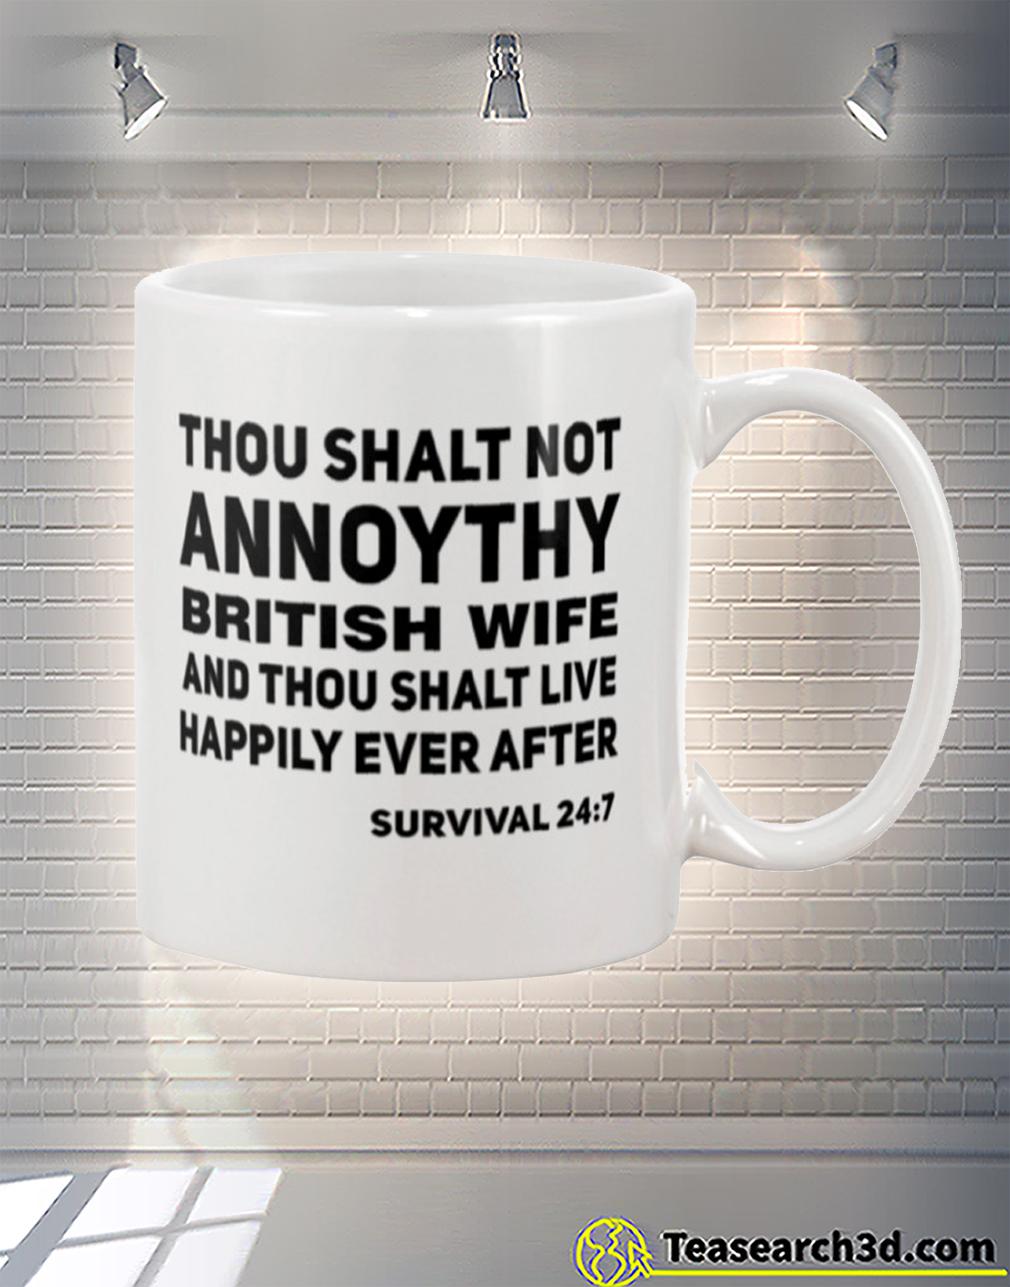 Thou shalt not annoythy british wife mug